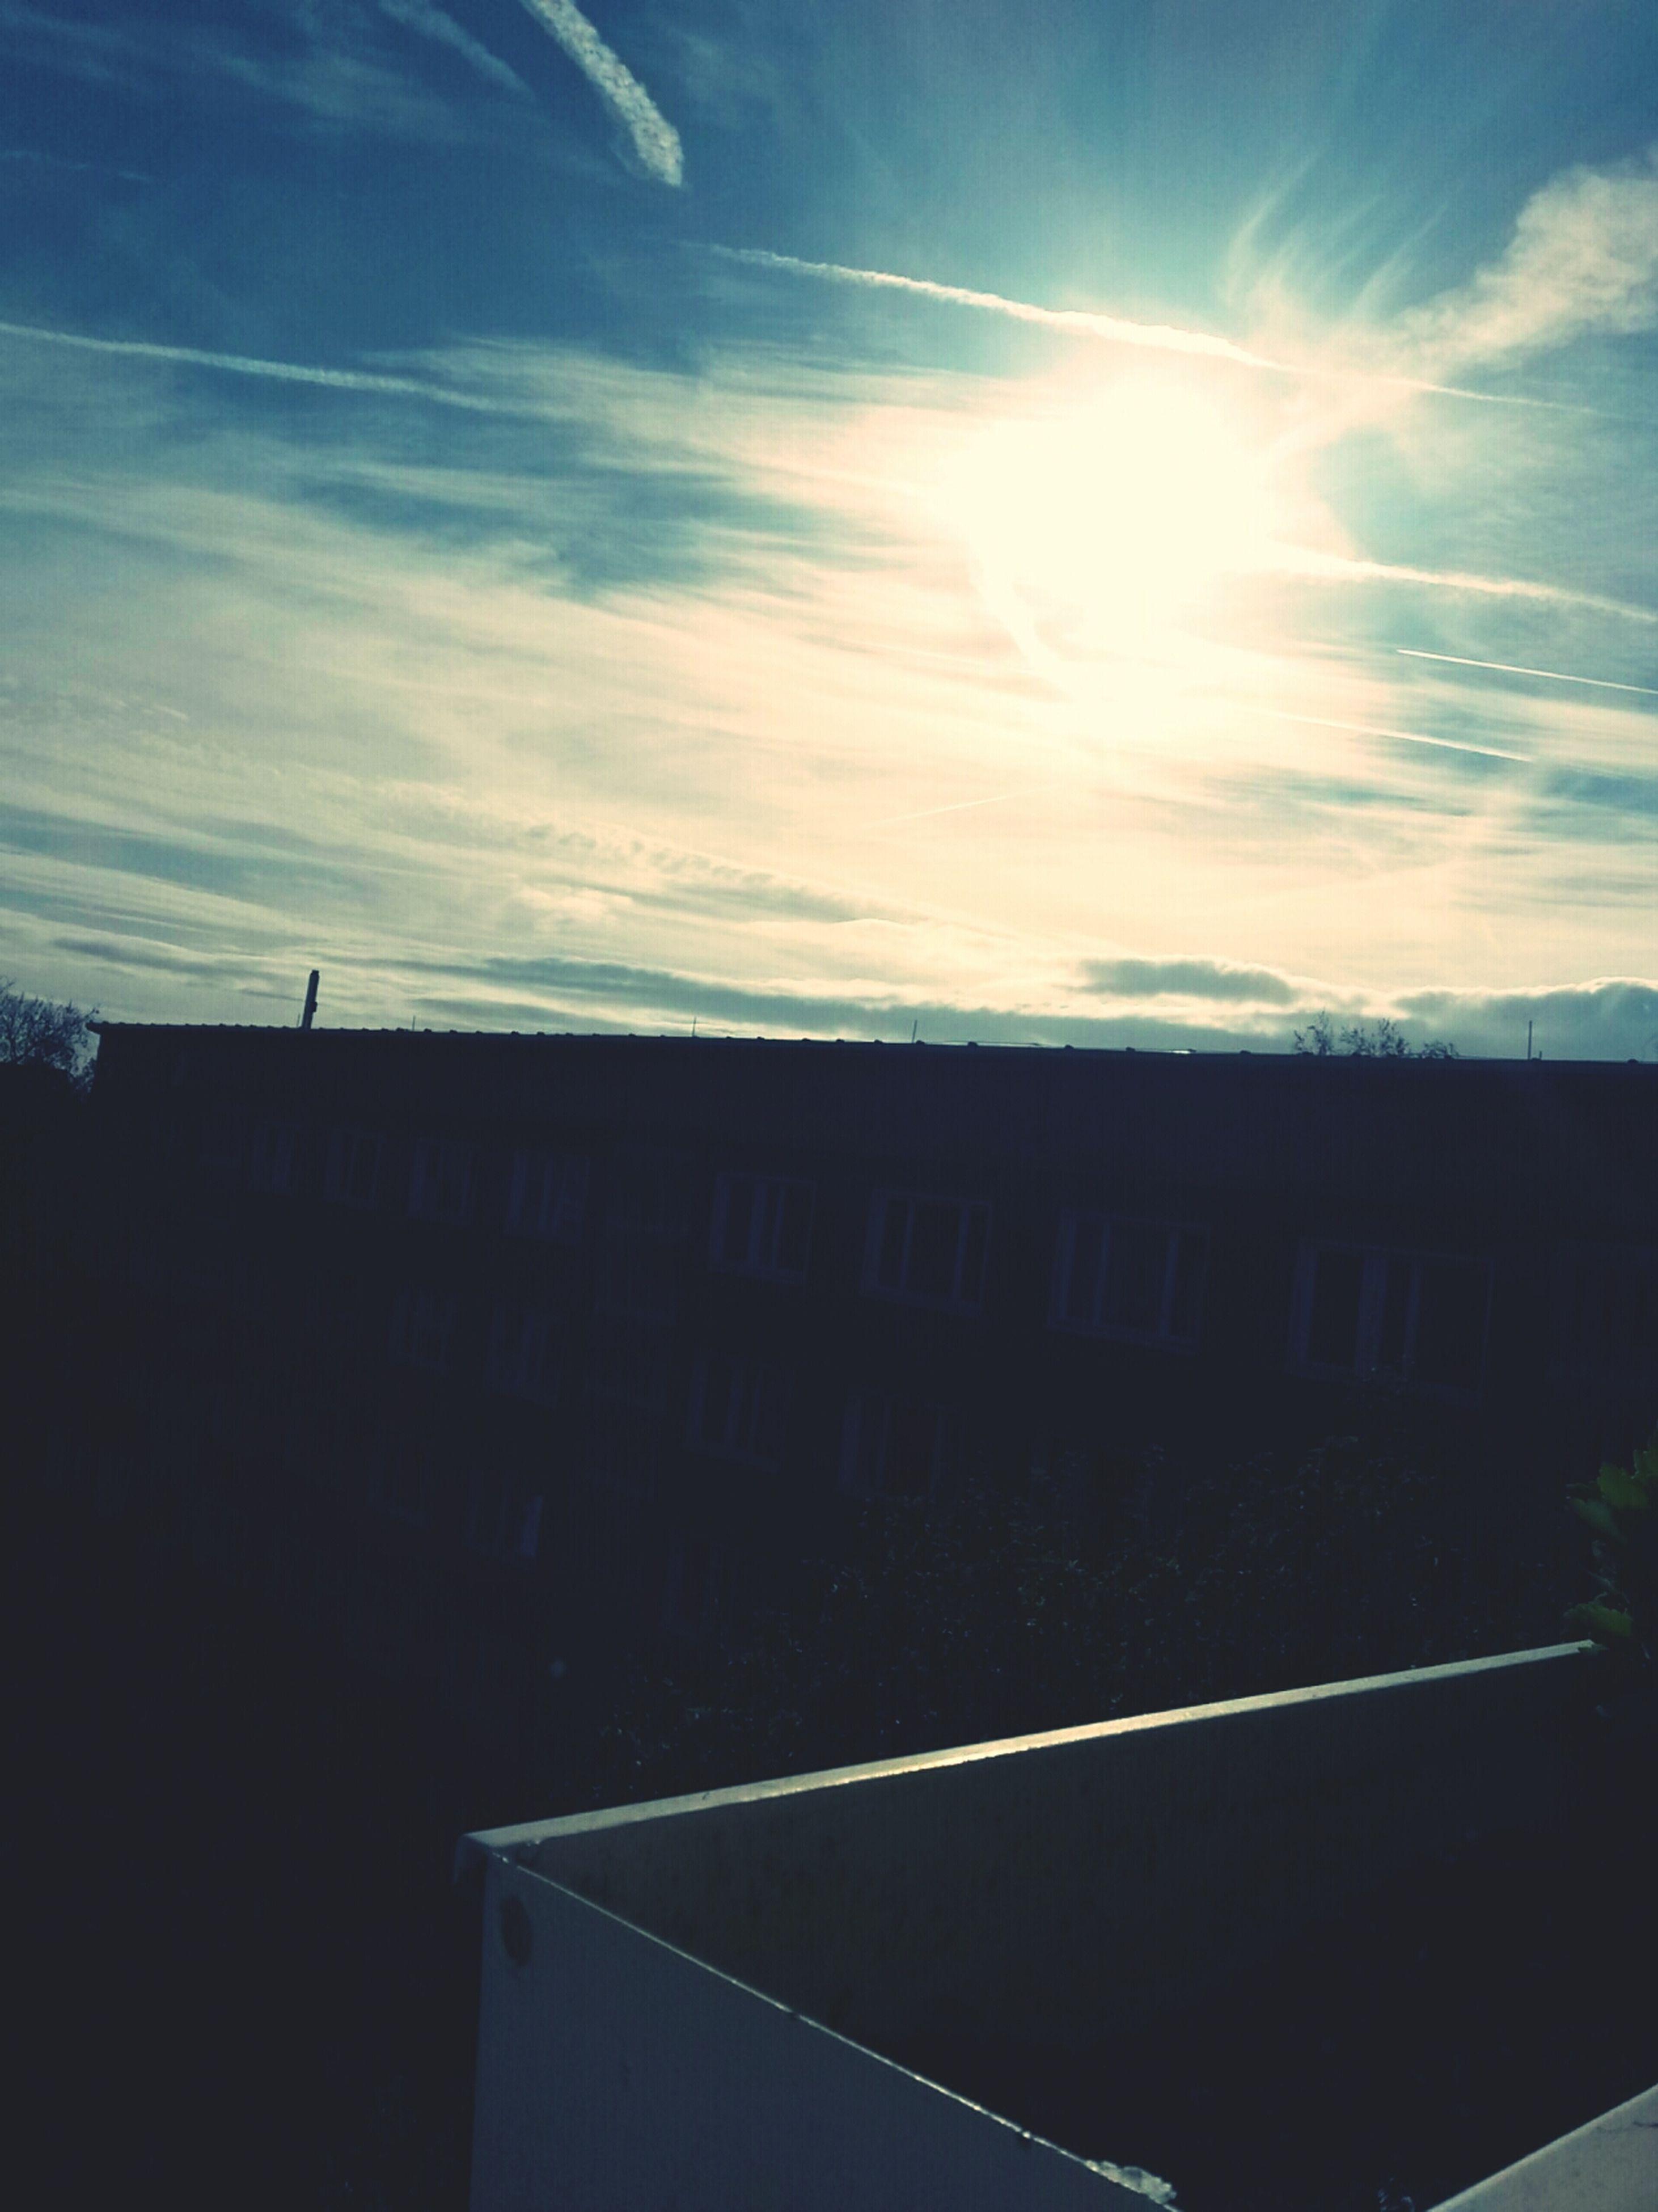 building exterior, architecture, built structure, sky, sun, sunlight, sunbeam, cloud - sky, low angle view, cloud, building, lens flare, blue, sunny, city, residential structure, residential building, outdoors, silhouette, house